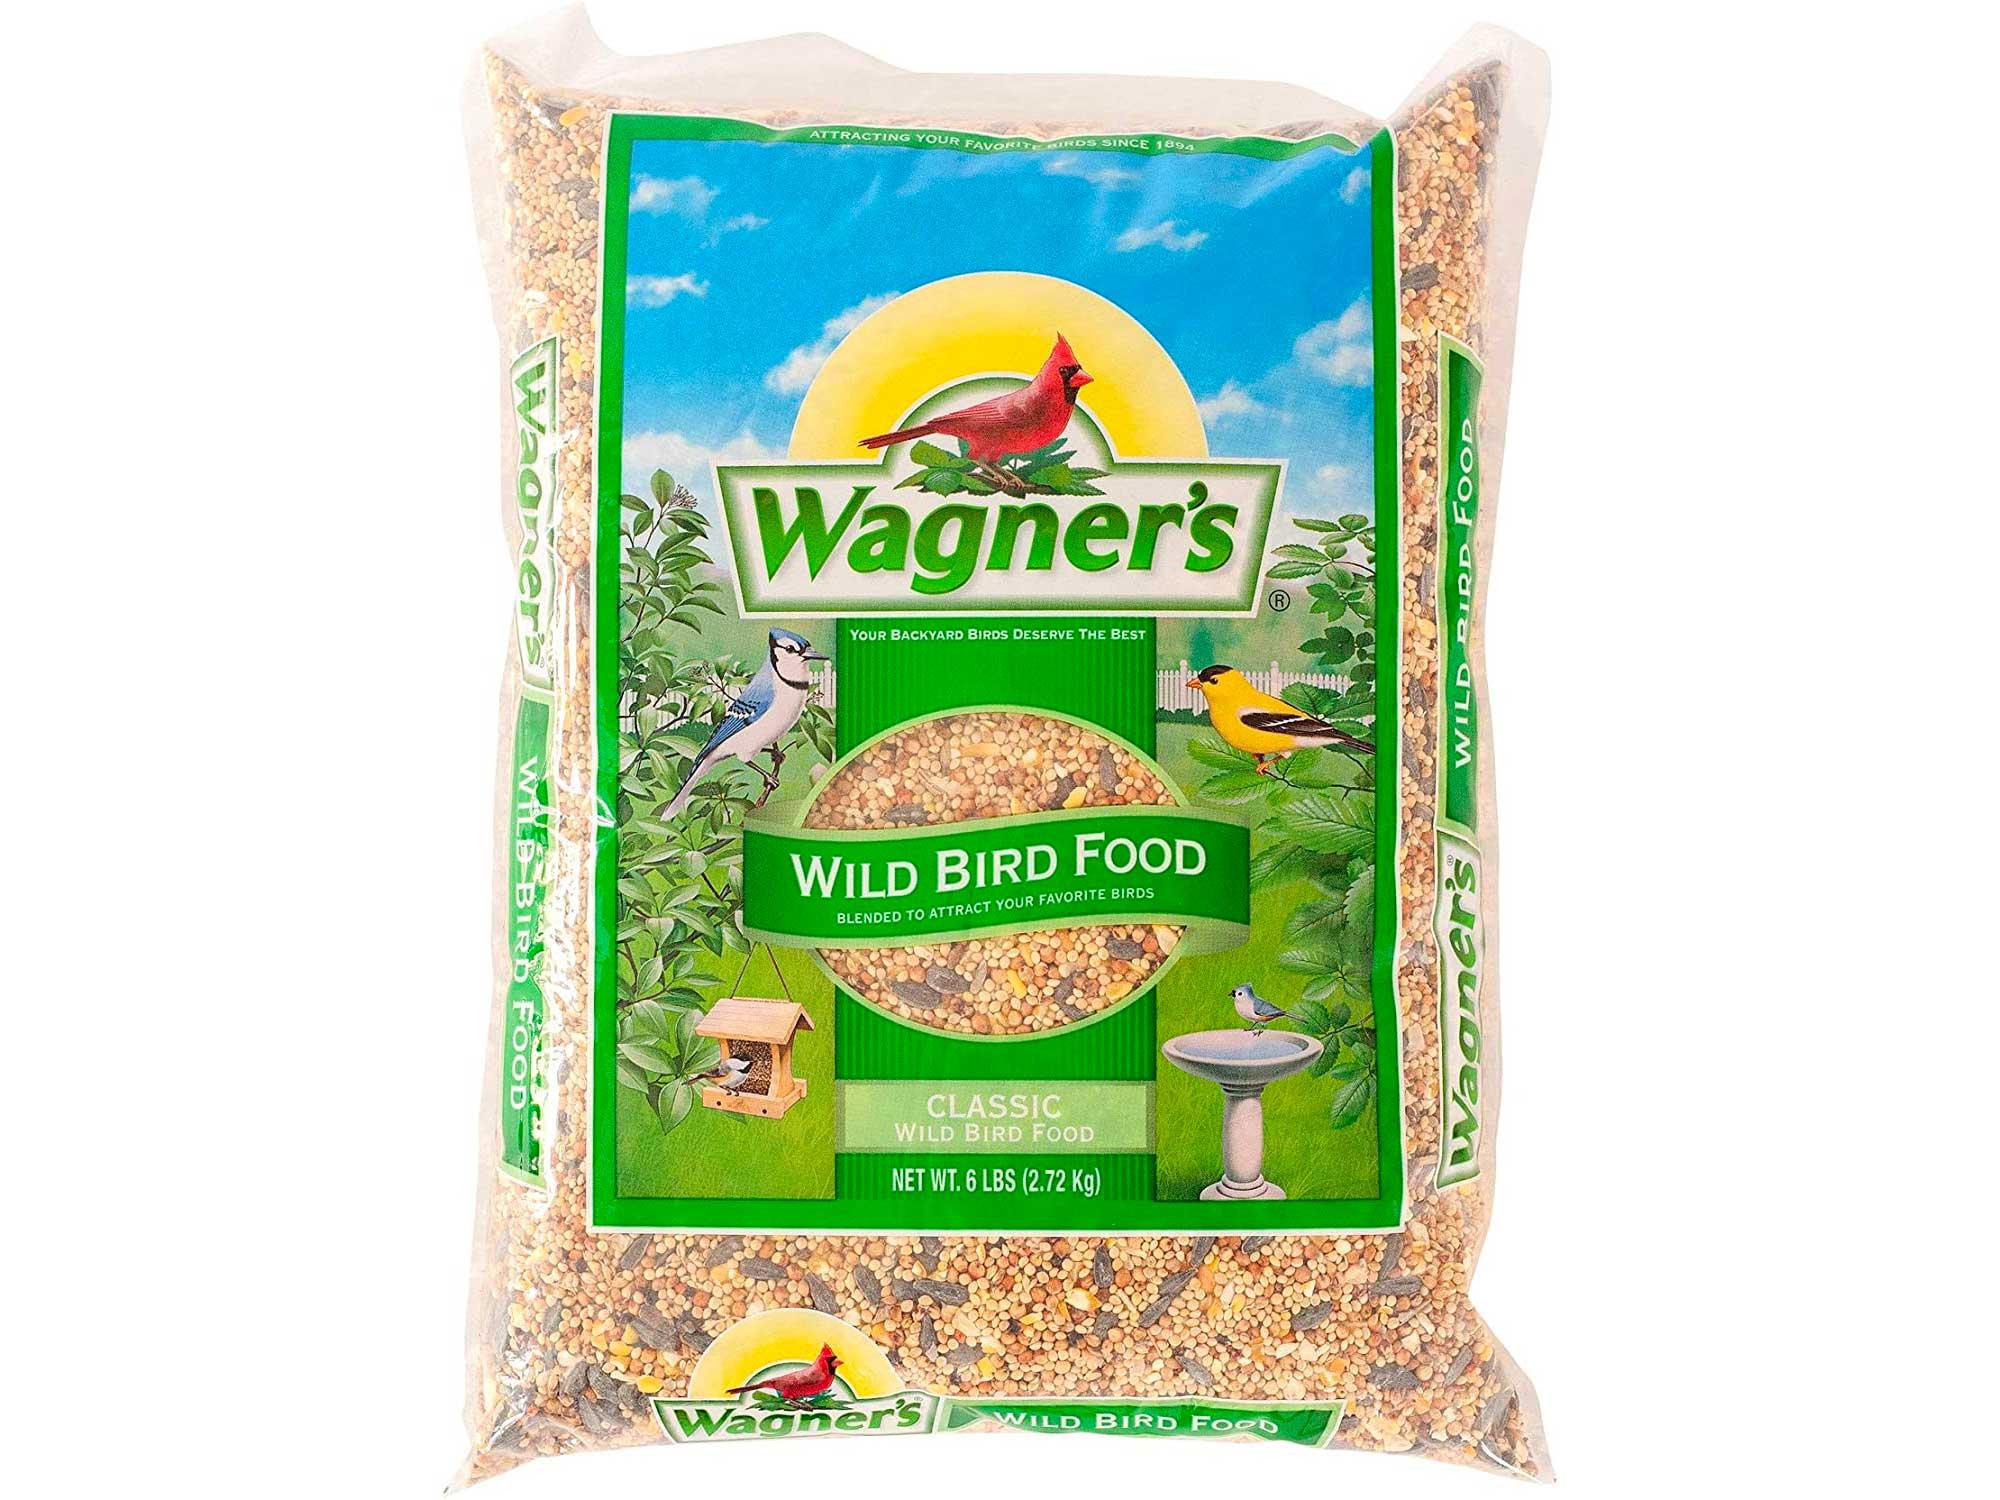 Wagner's budget bird seed blend